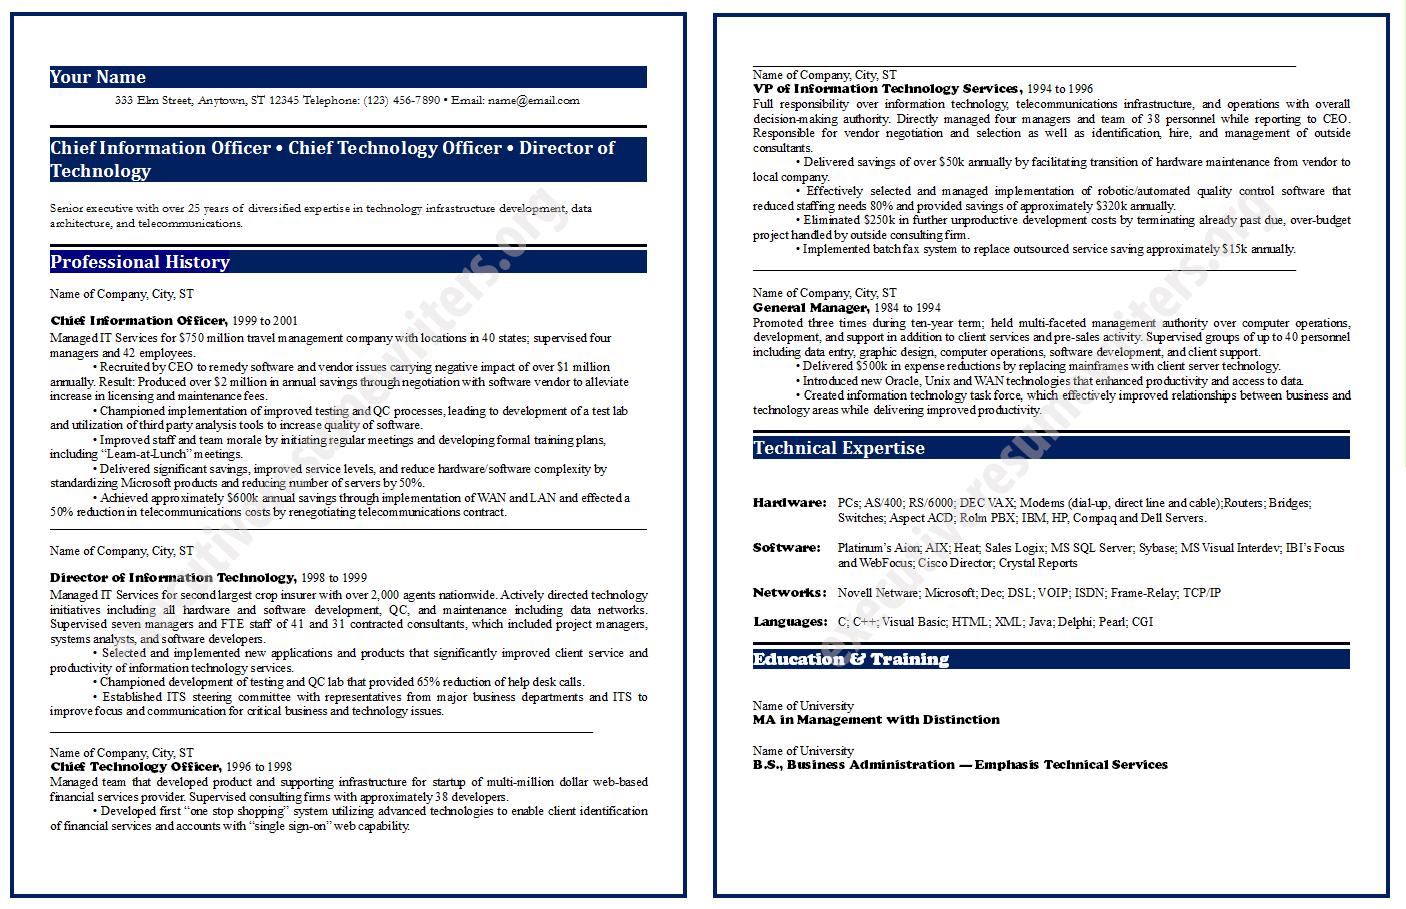 CIO Resume Format2014 http//www.executiveresumewriters